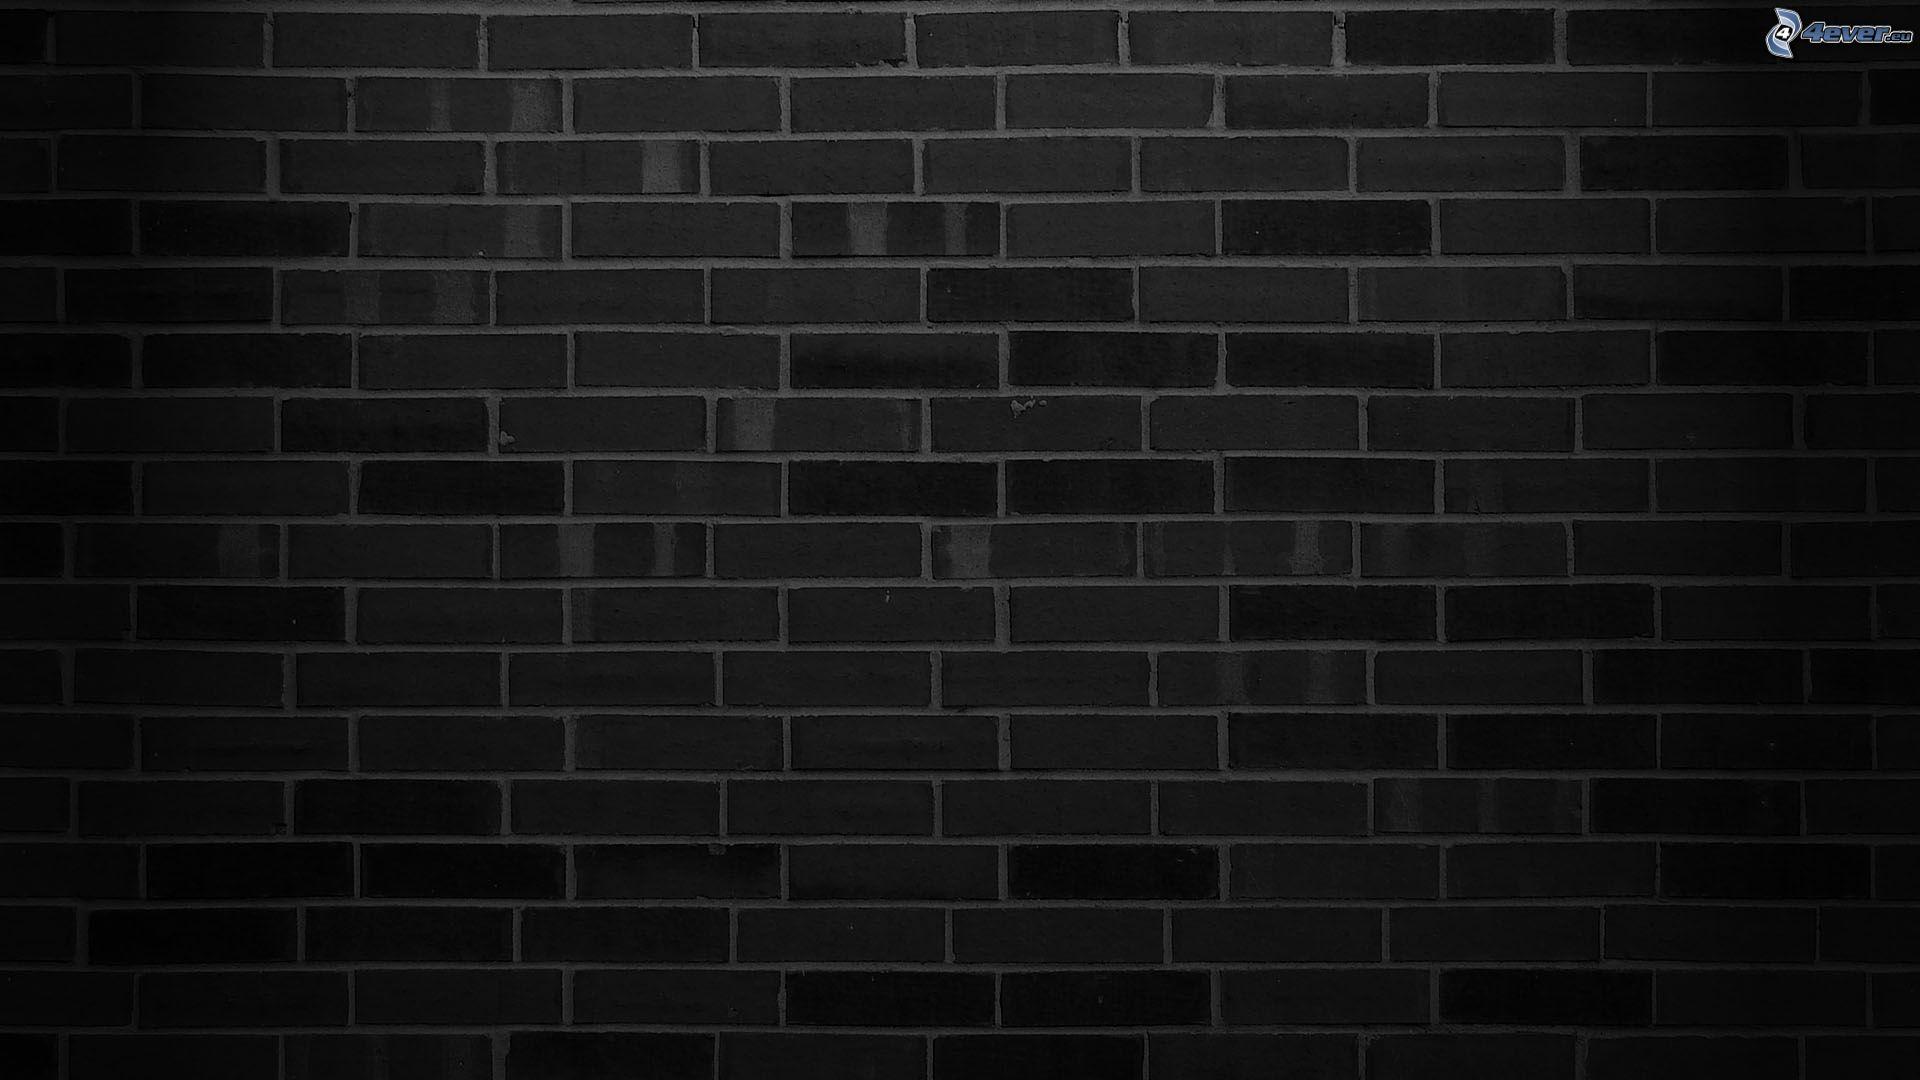 Tehlov stena for Esteban paredes wallpaper hd